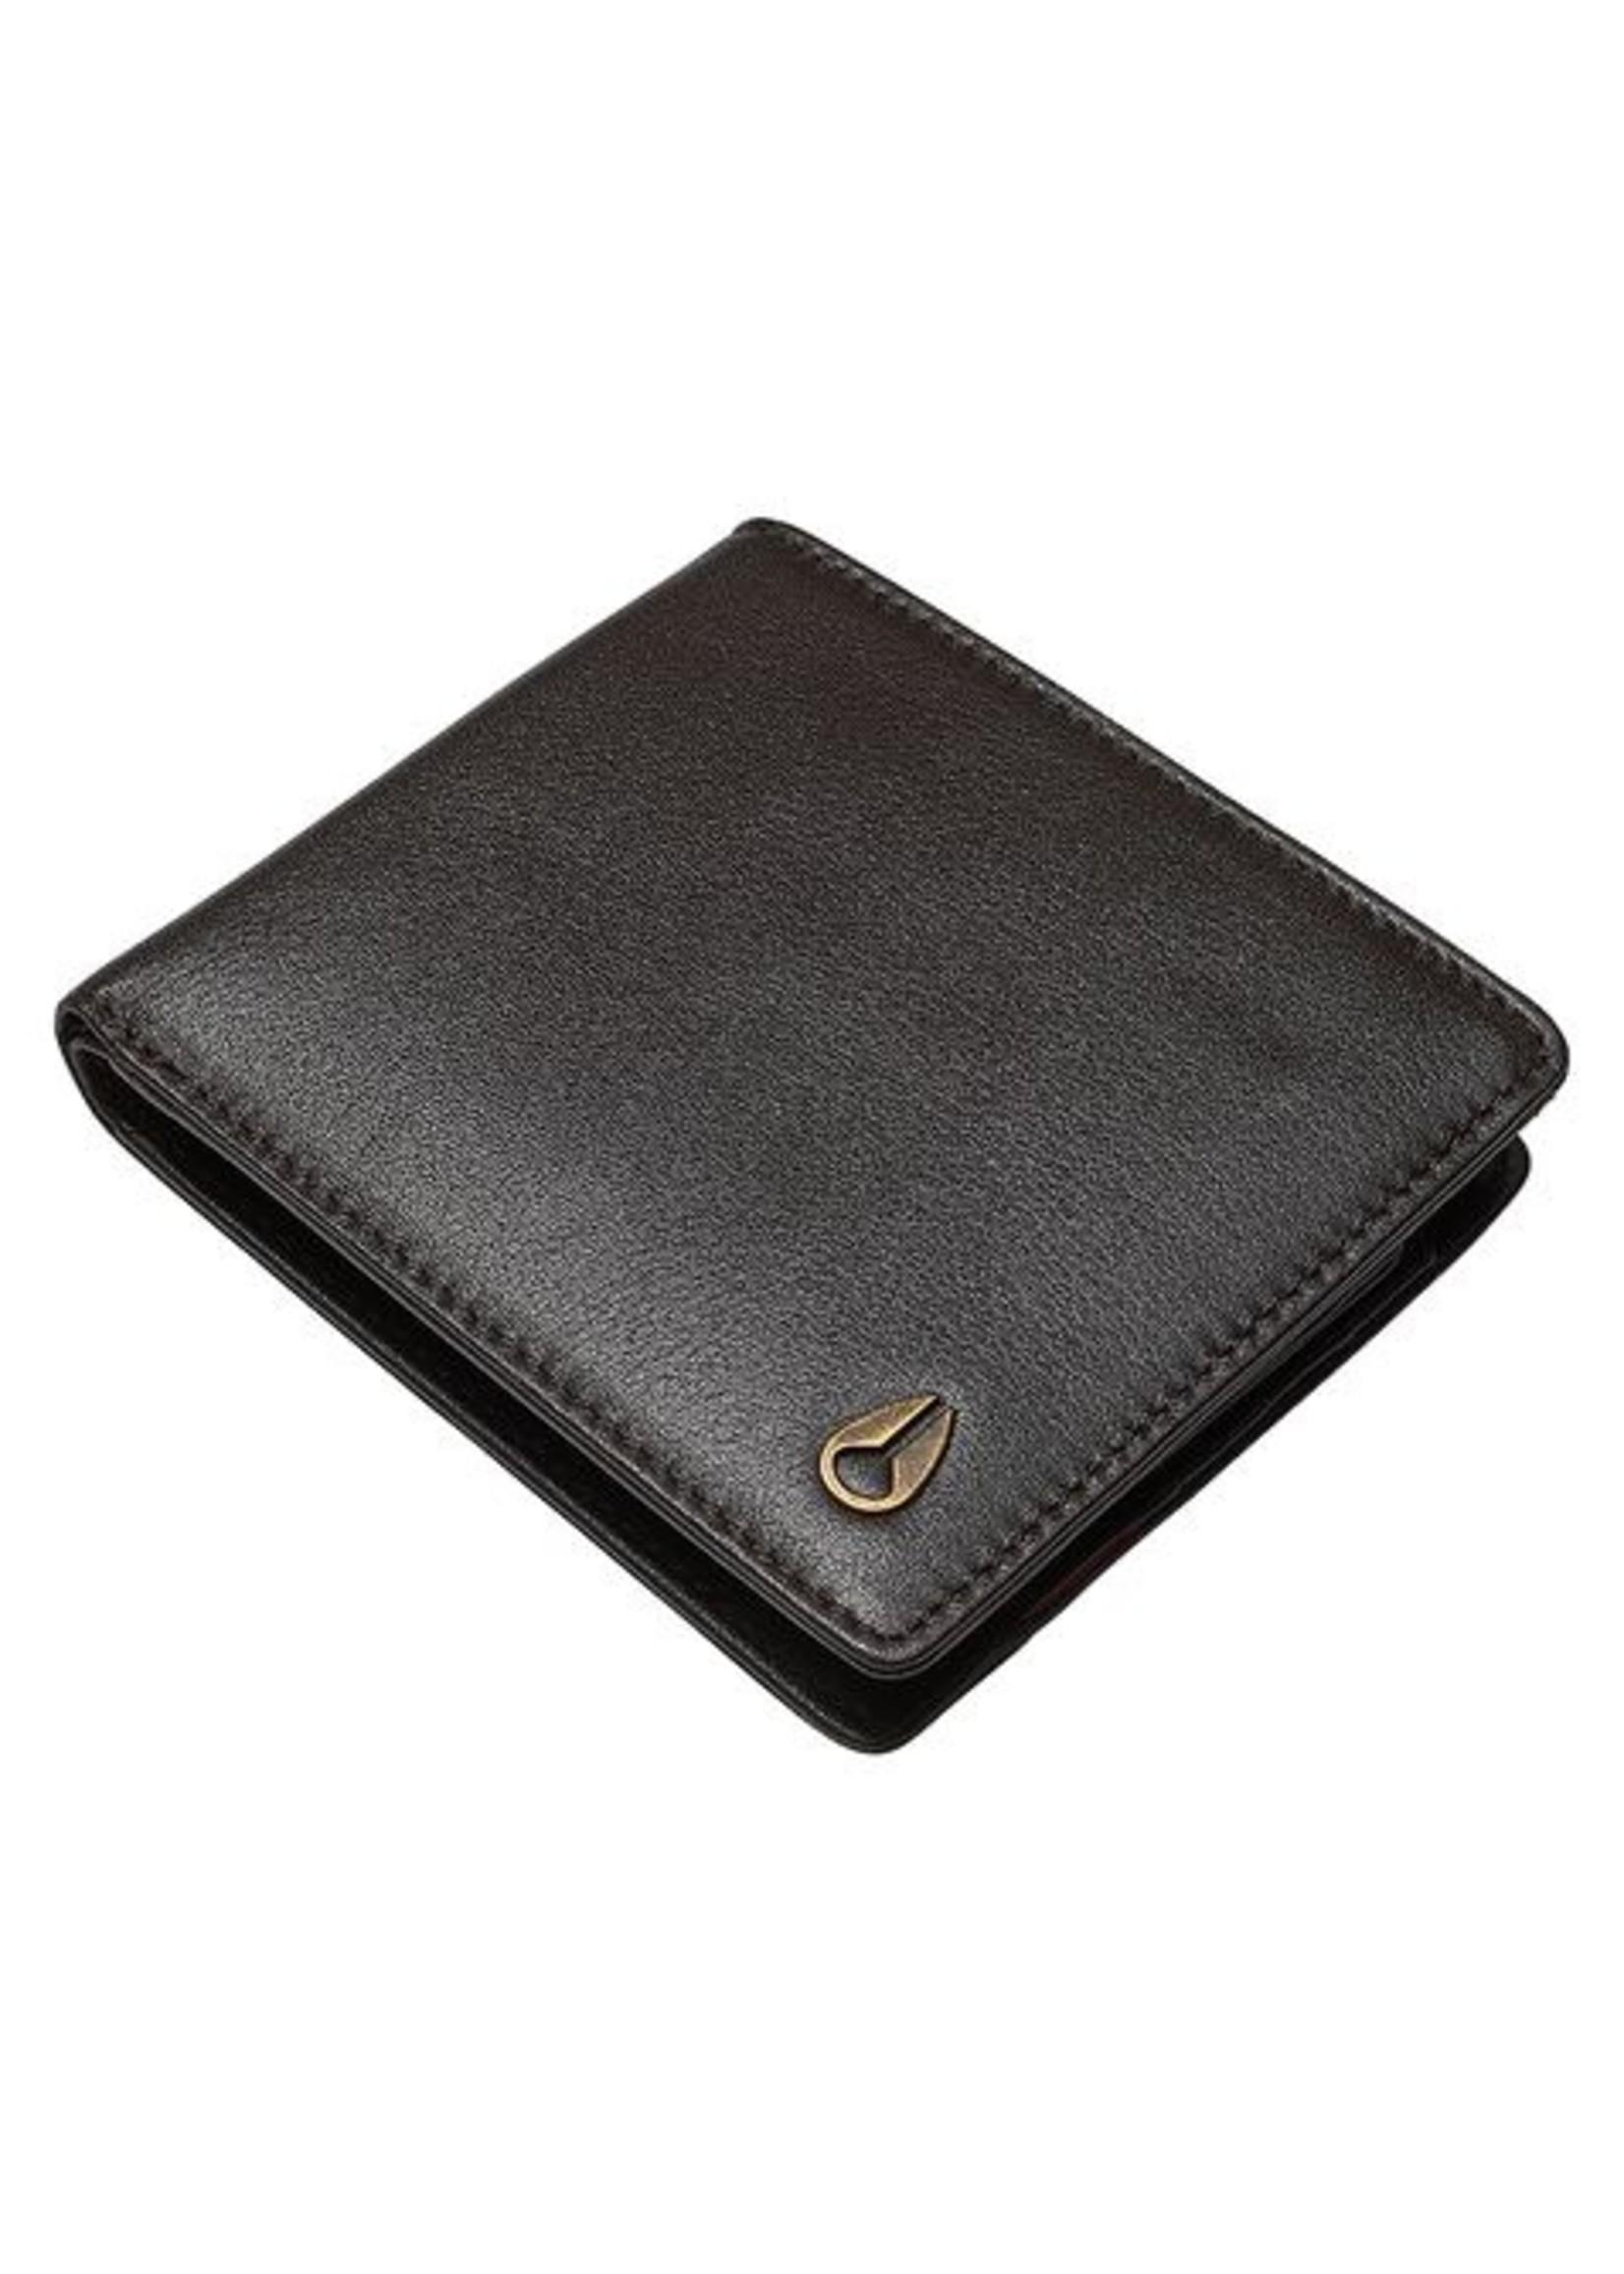 NIXON PASS Leather Wallet, Brown